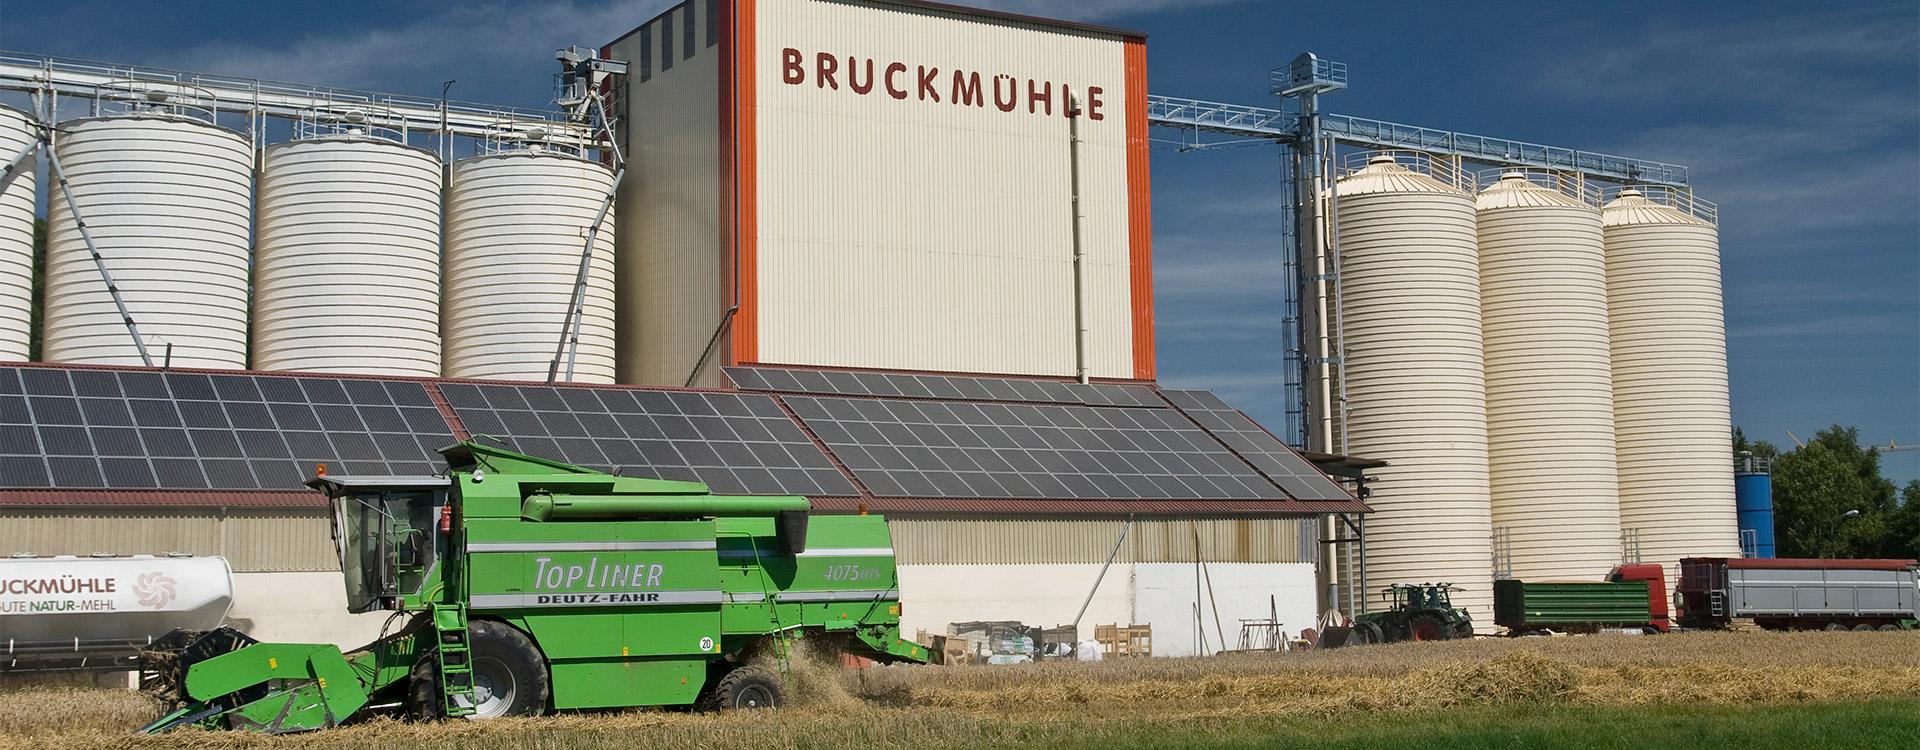 Grain Silo Agriculture - Lipp System